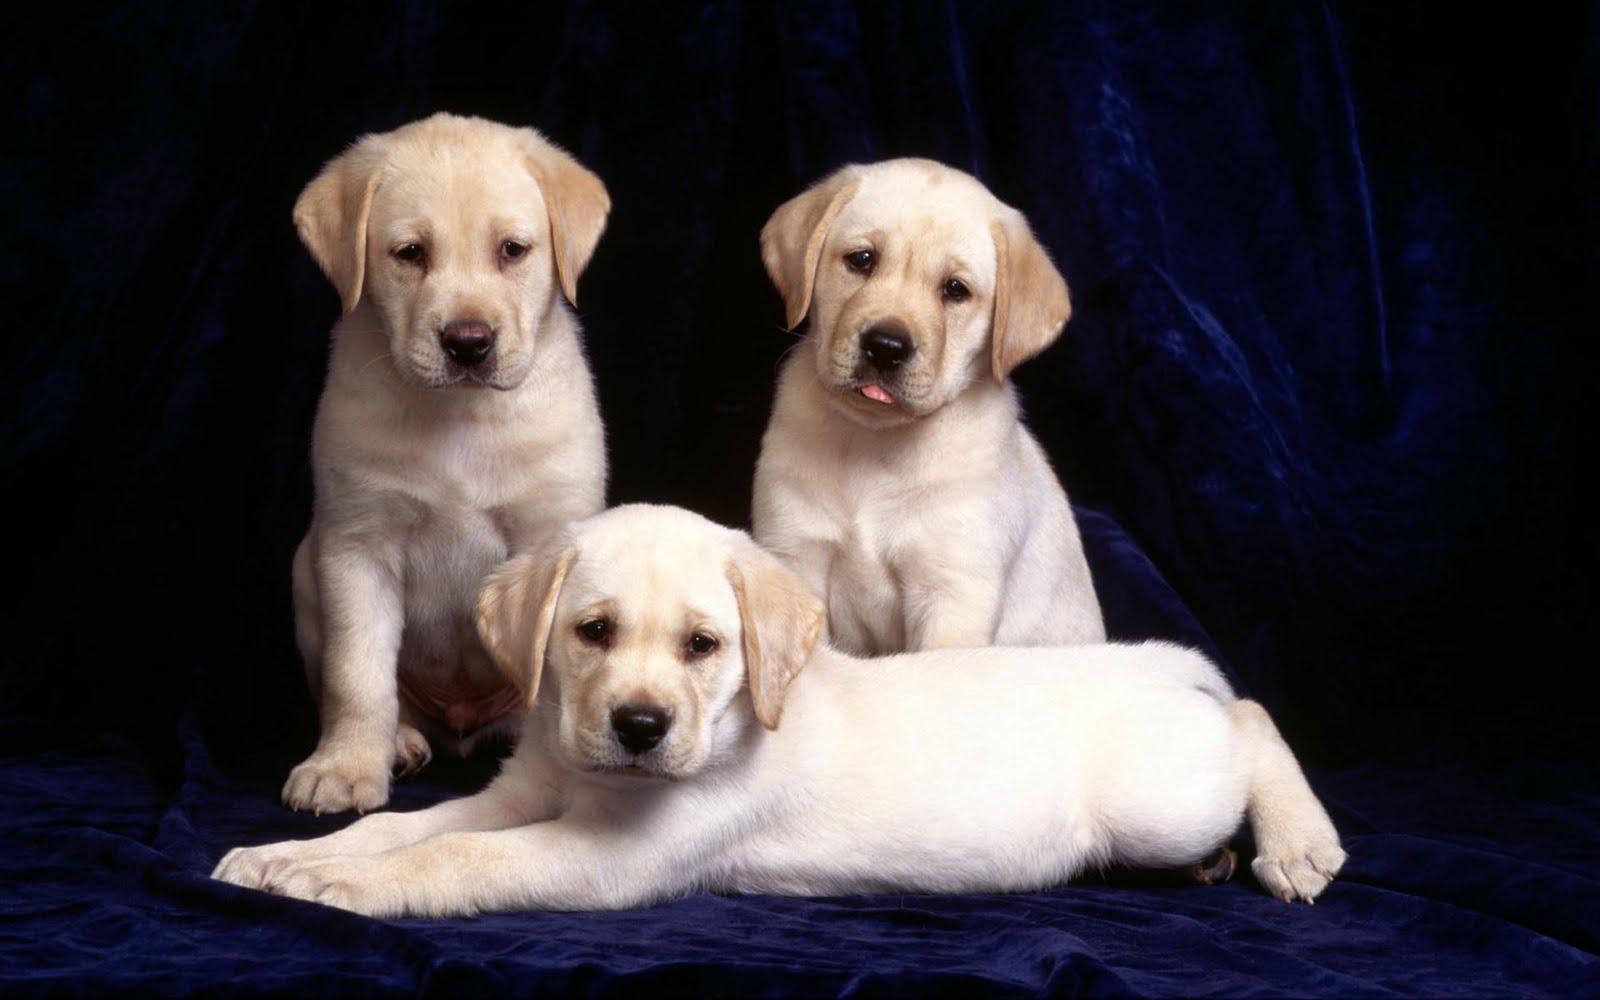 http://1.bp.blogspot.com/-K3-V7mKDufo/Tr__27hcLFI/AAAAAAAACv8/DyJisbdVzhI/s1600/dog_labrador-WALLPAPERS-WALLPAPE.IN_2011.jpg